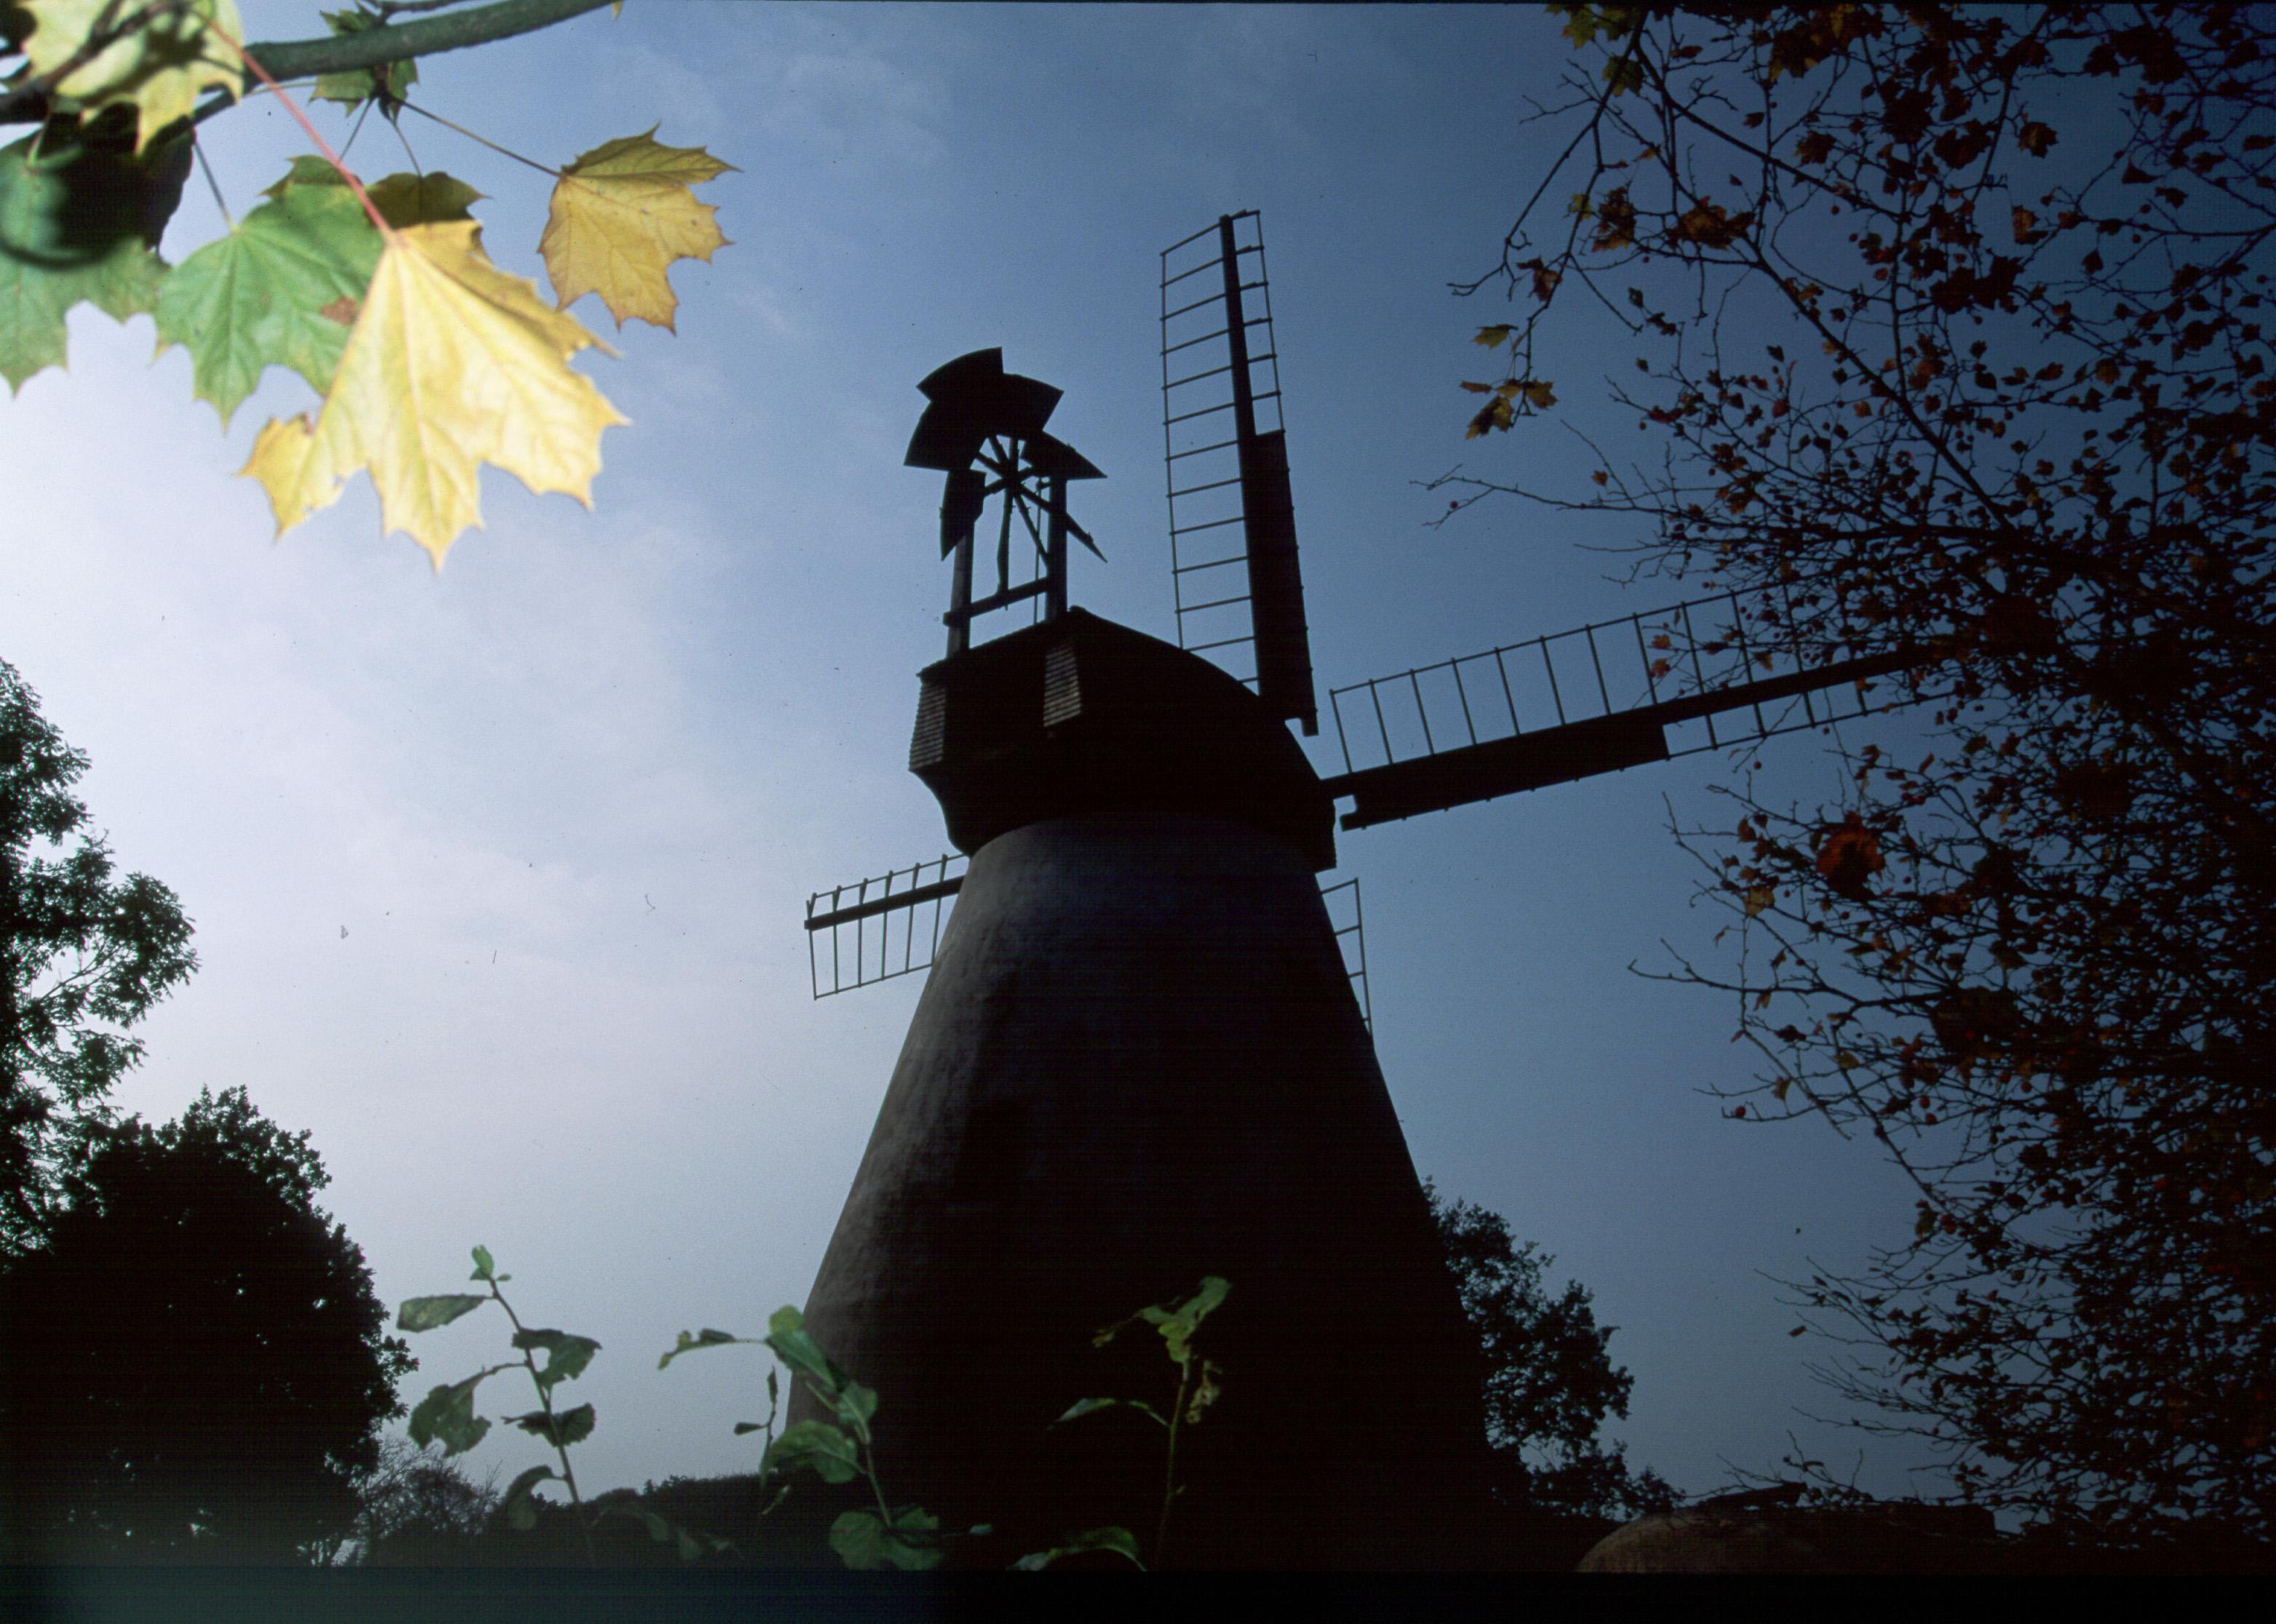 Heimser Windmühle